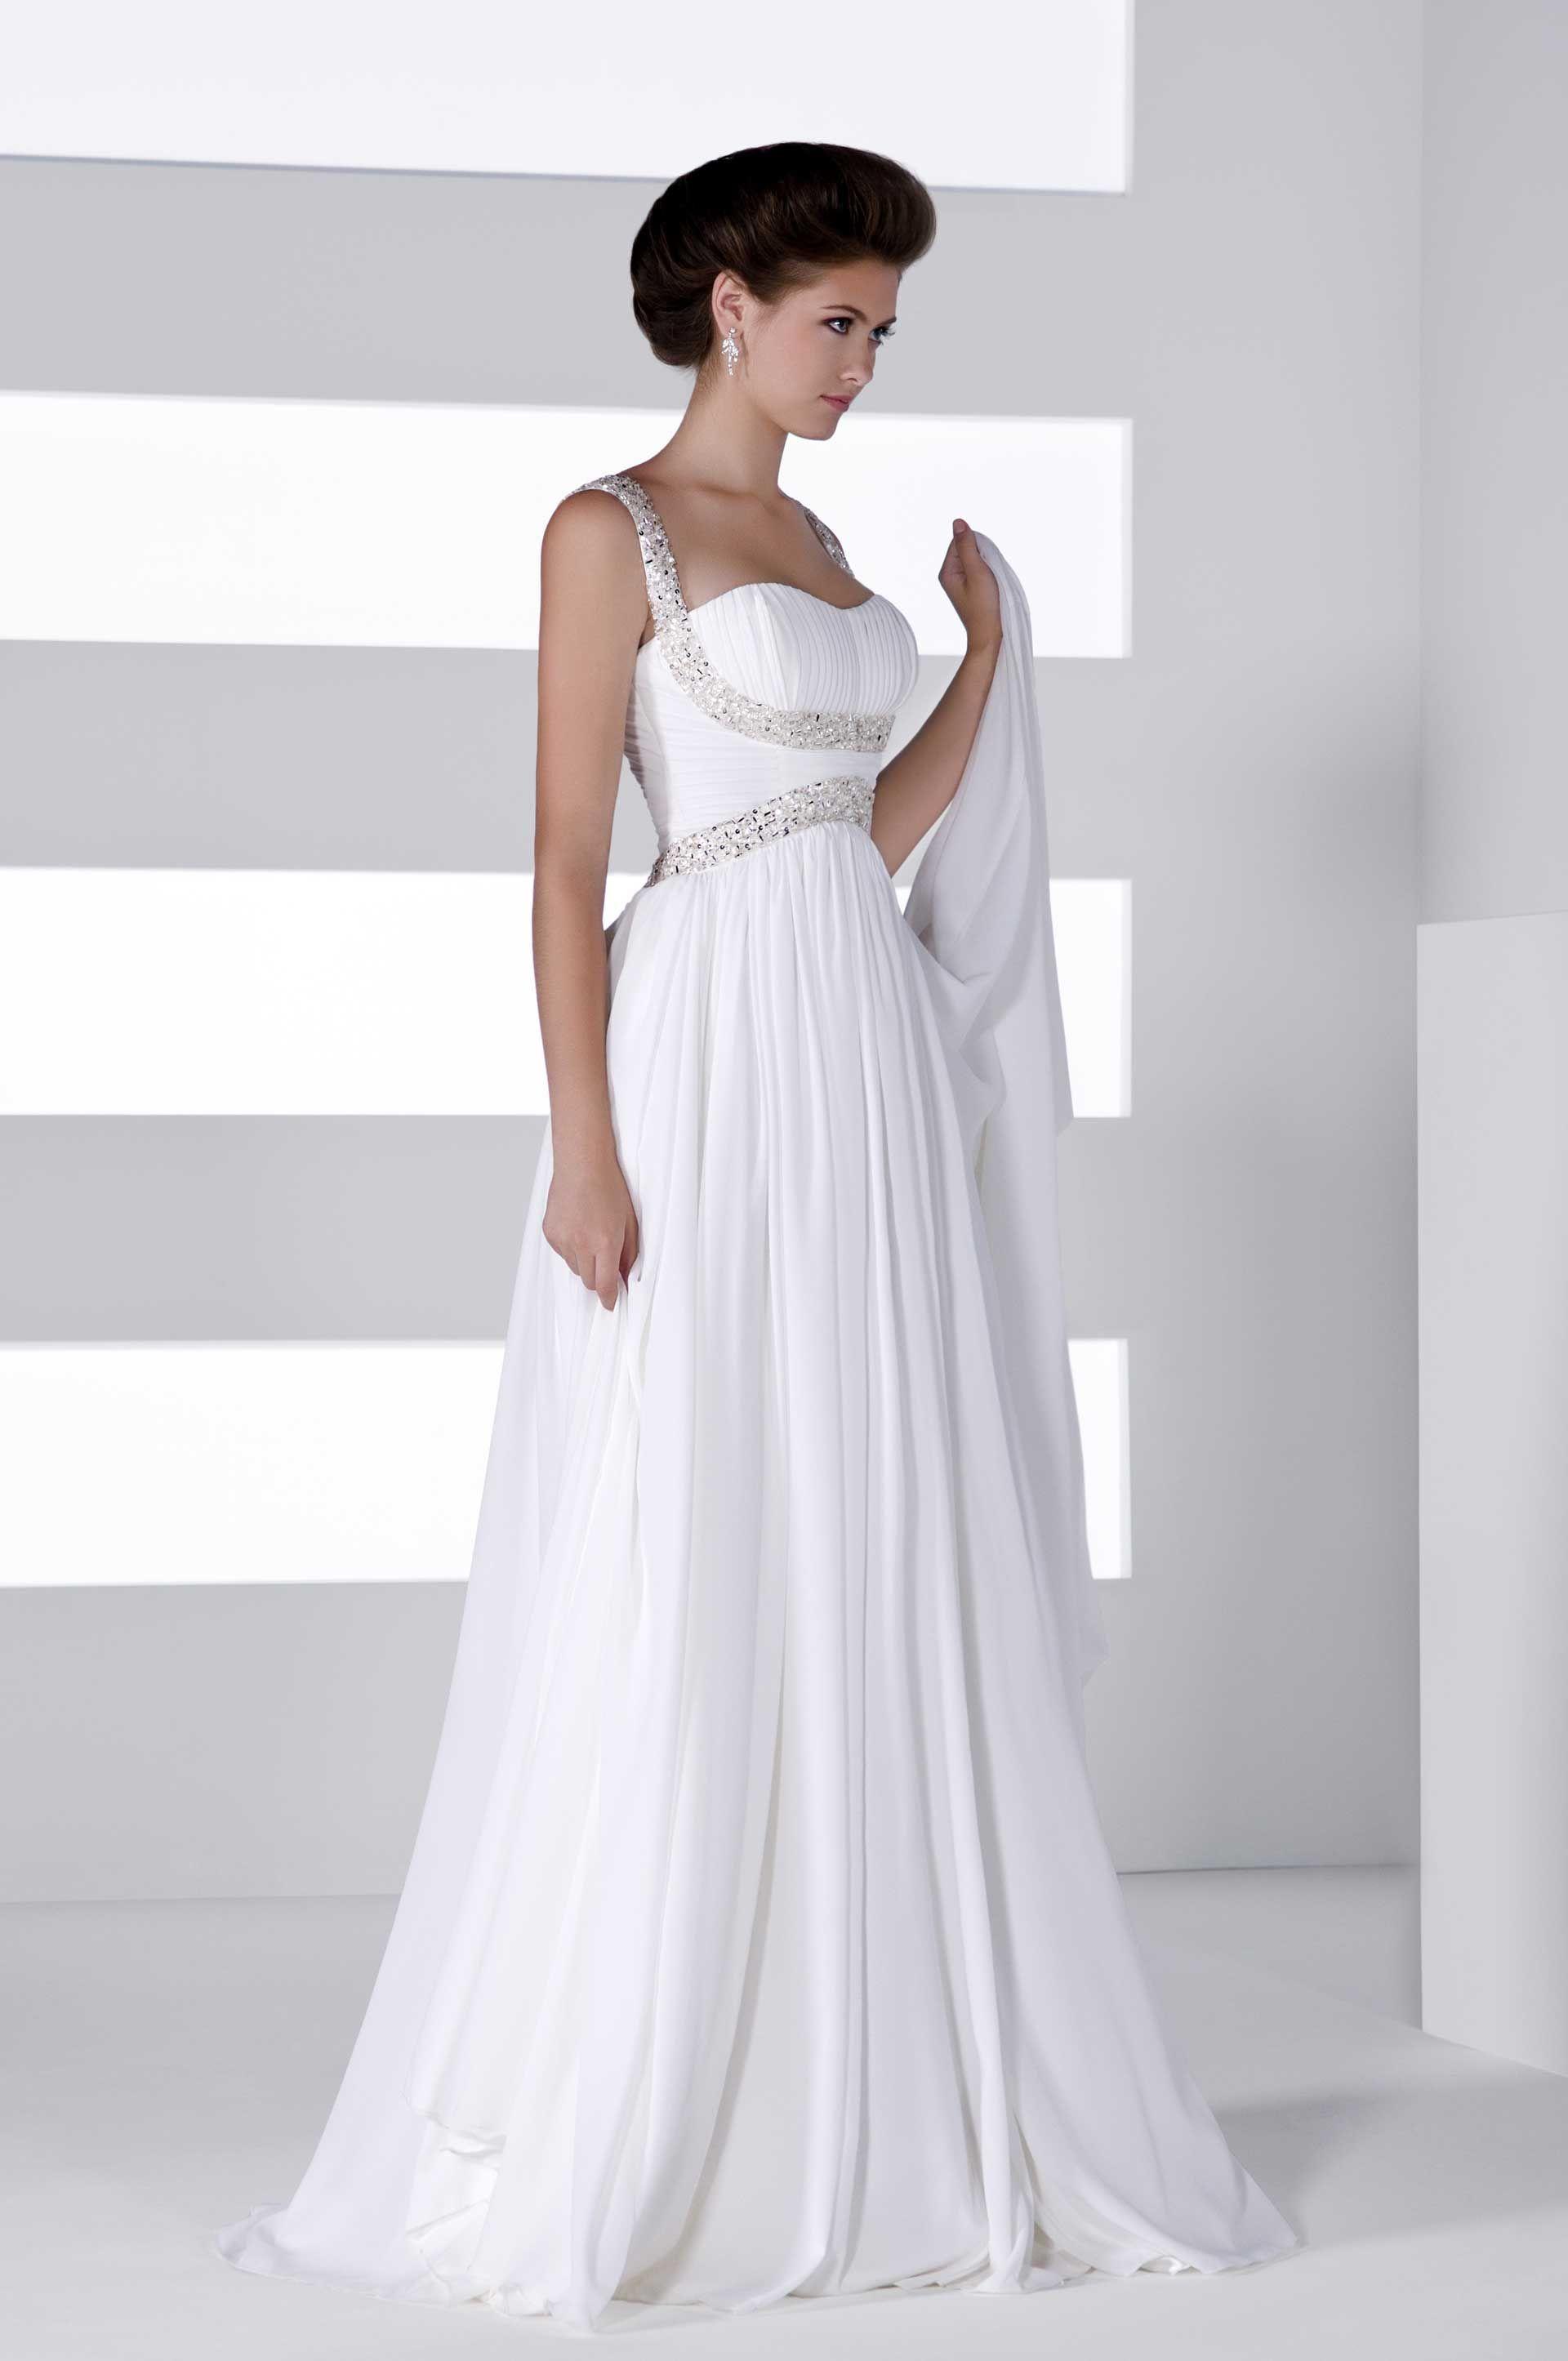 Agatha wedding gown for pregnant bride | wedding dresses | Pinterest ...